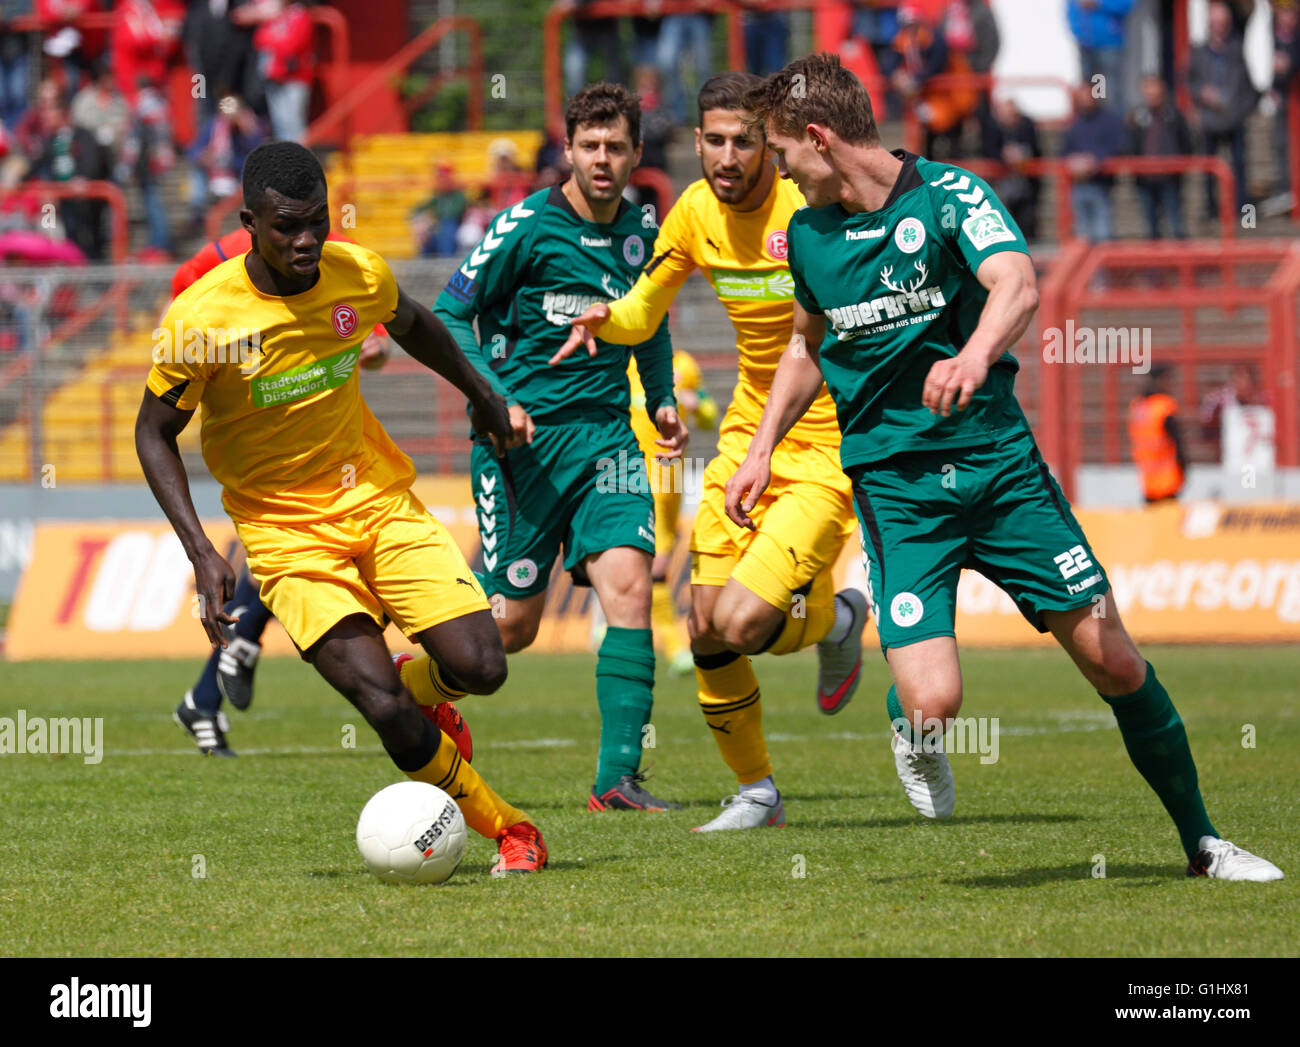 sports, football, Regional League West, 2015/2016, Rot Weiss Oberhausen versus Fortuna Duesseldorf U23 4:2, Stadium - Stock Image